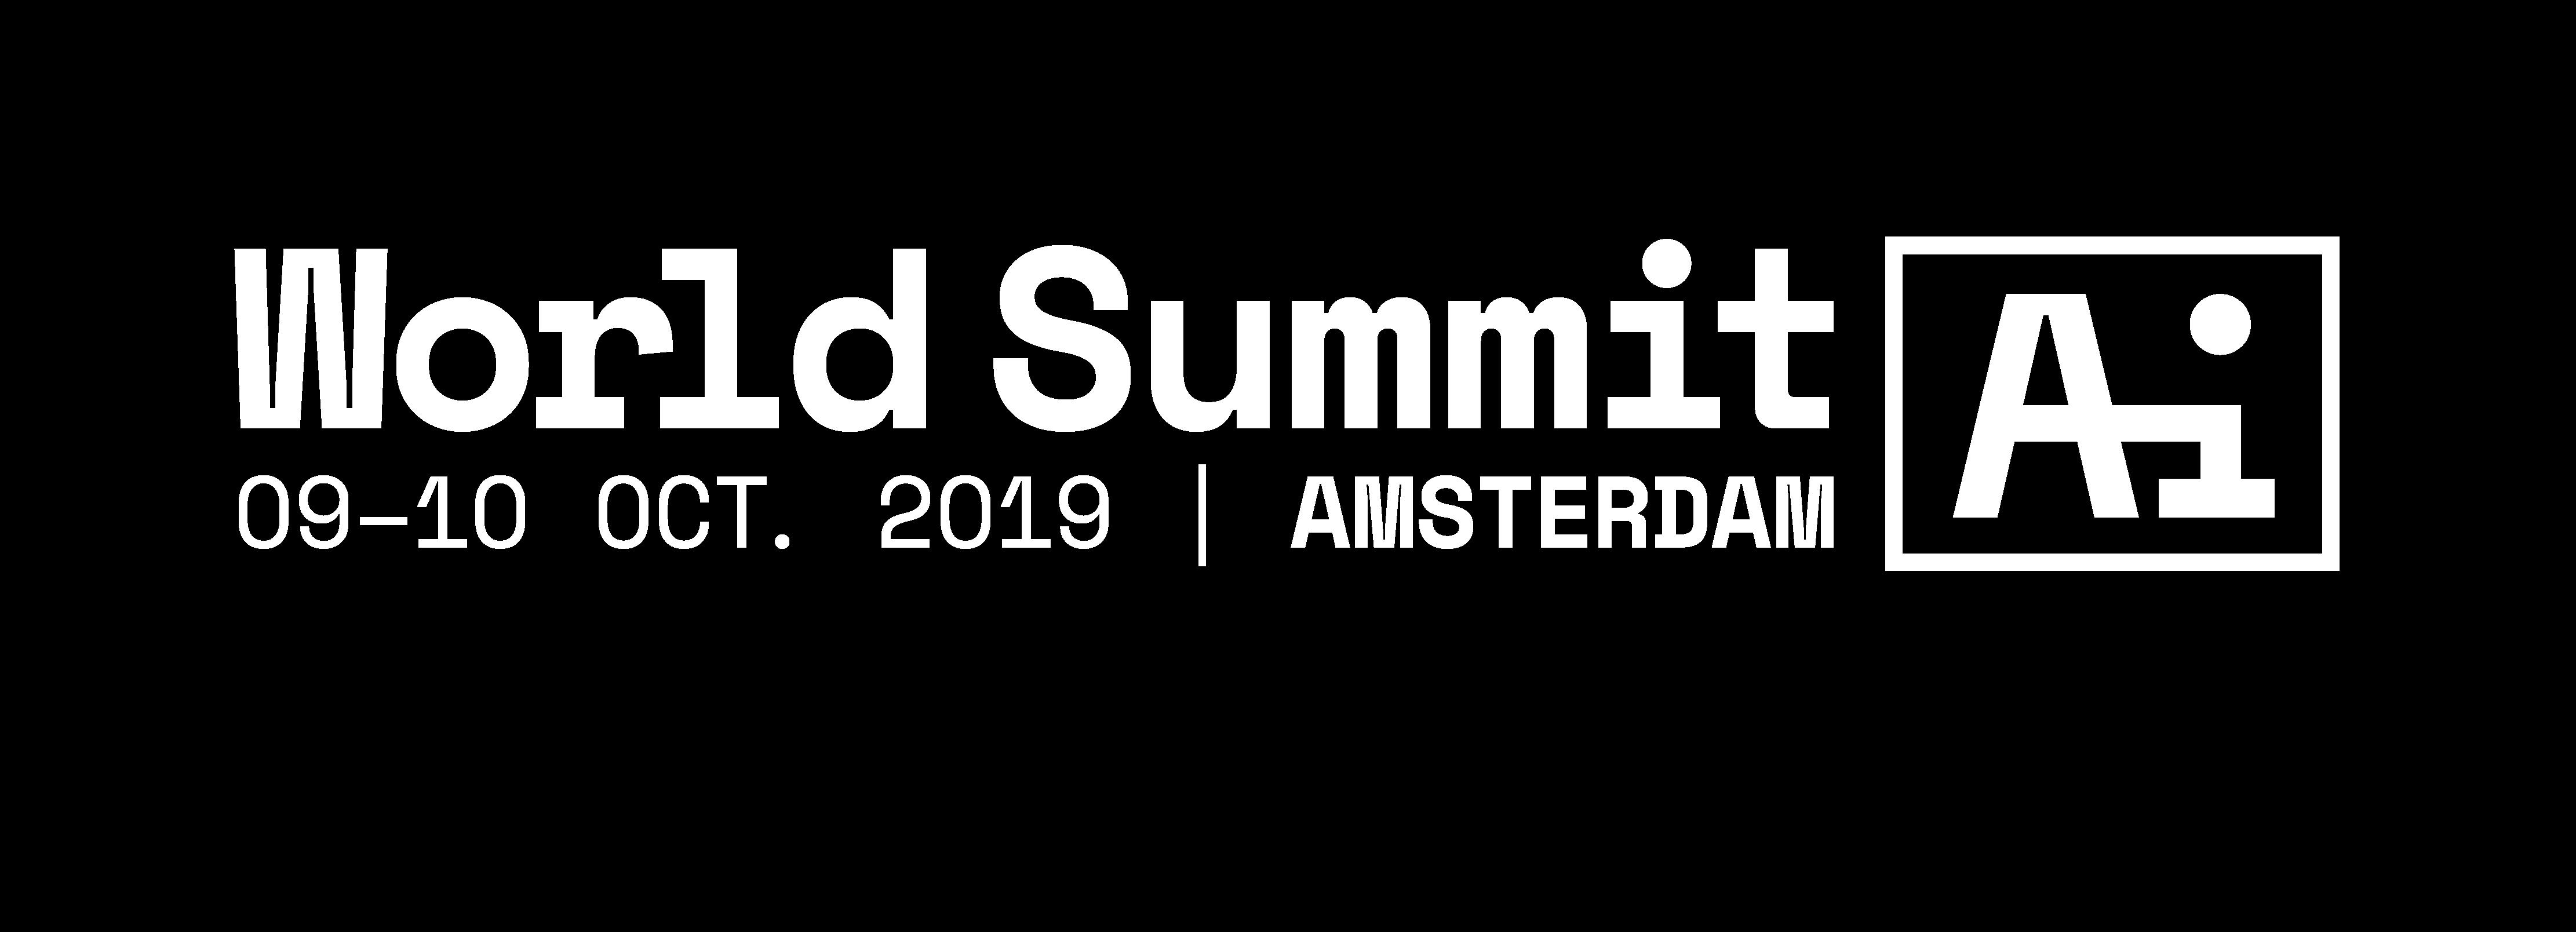 World Summit AI | The World's Leading AI Summit | Oct 2019